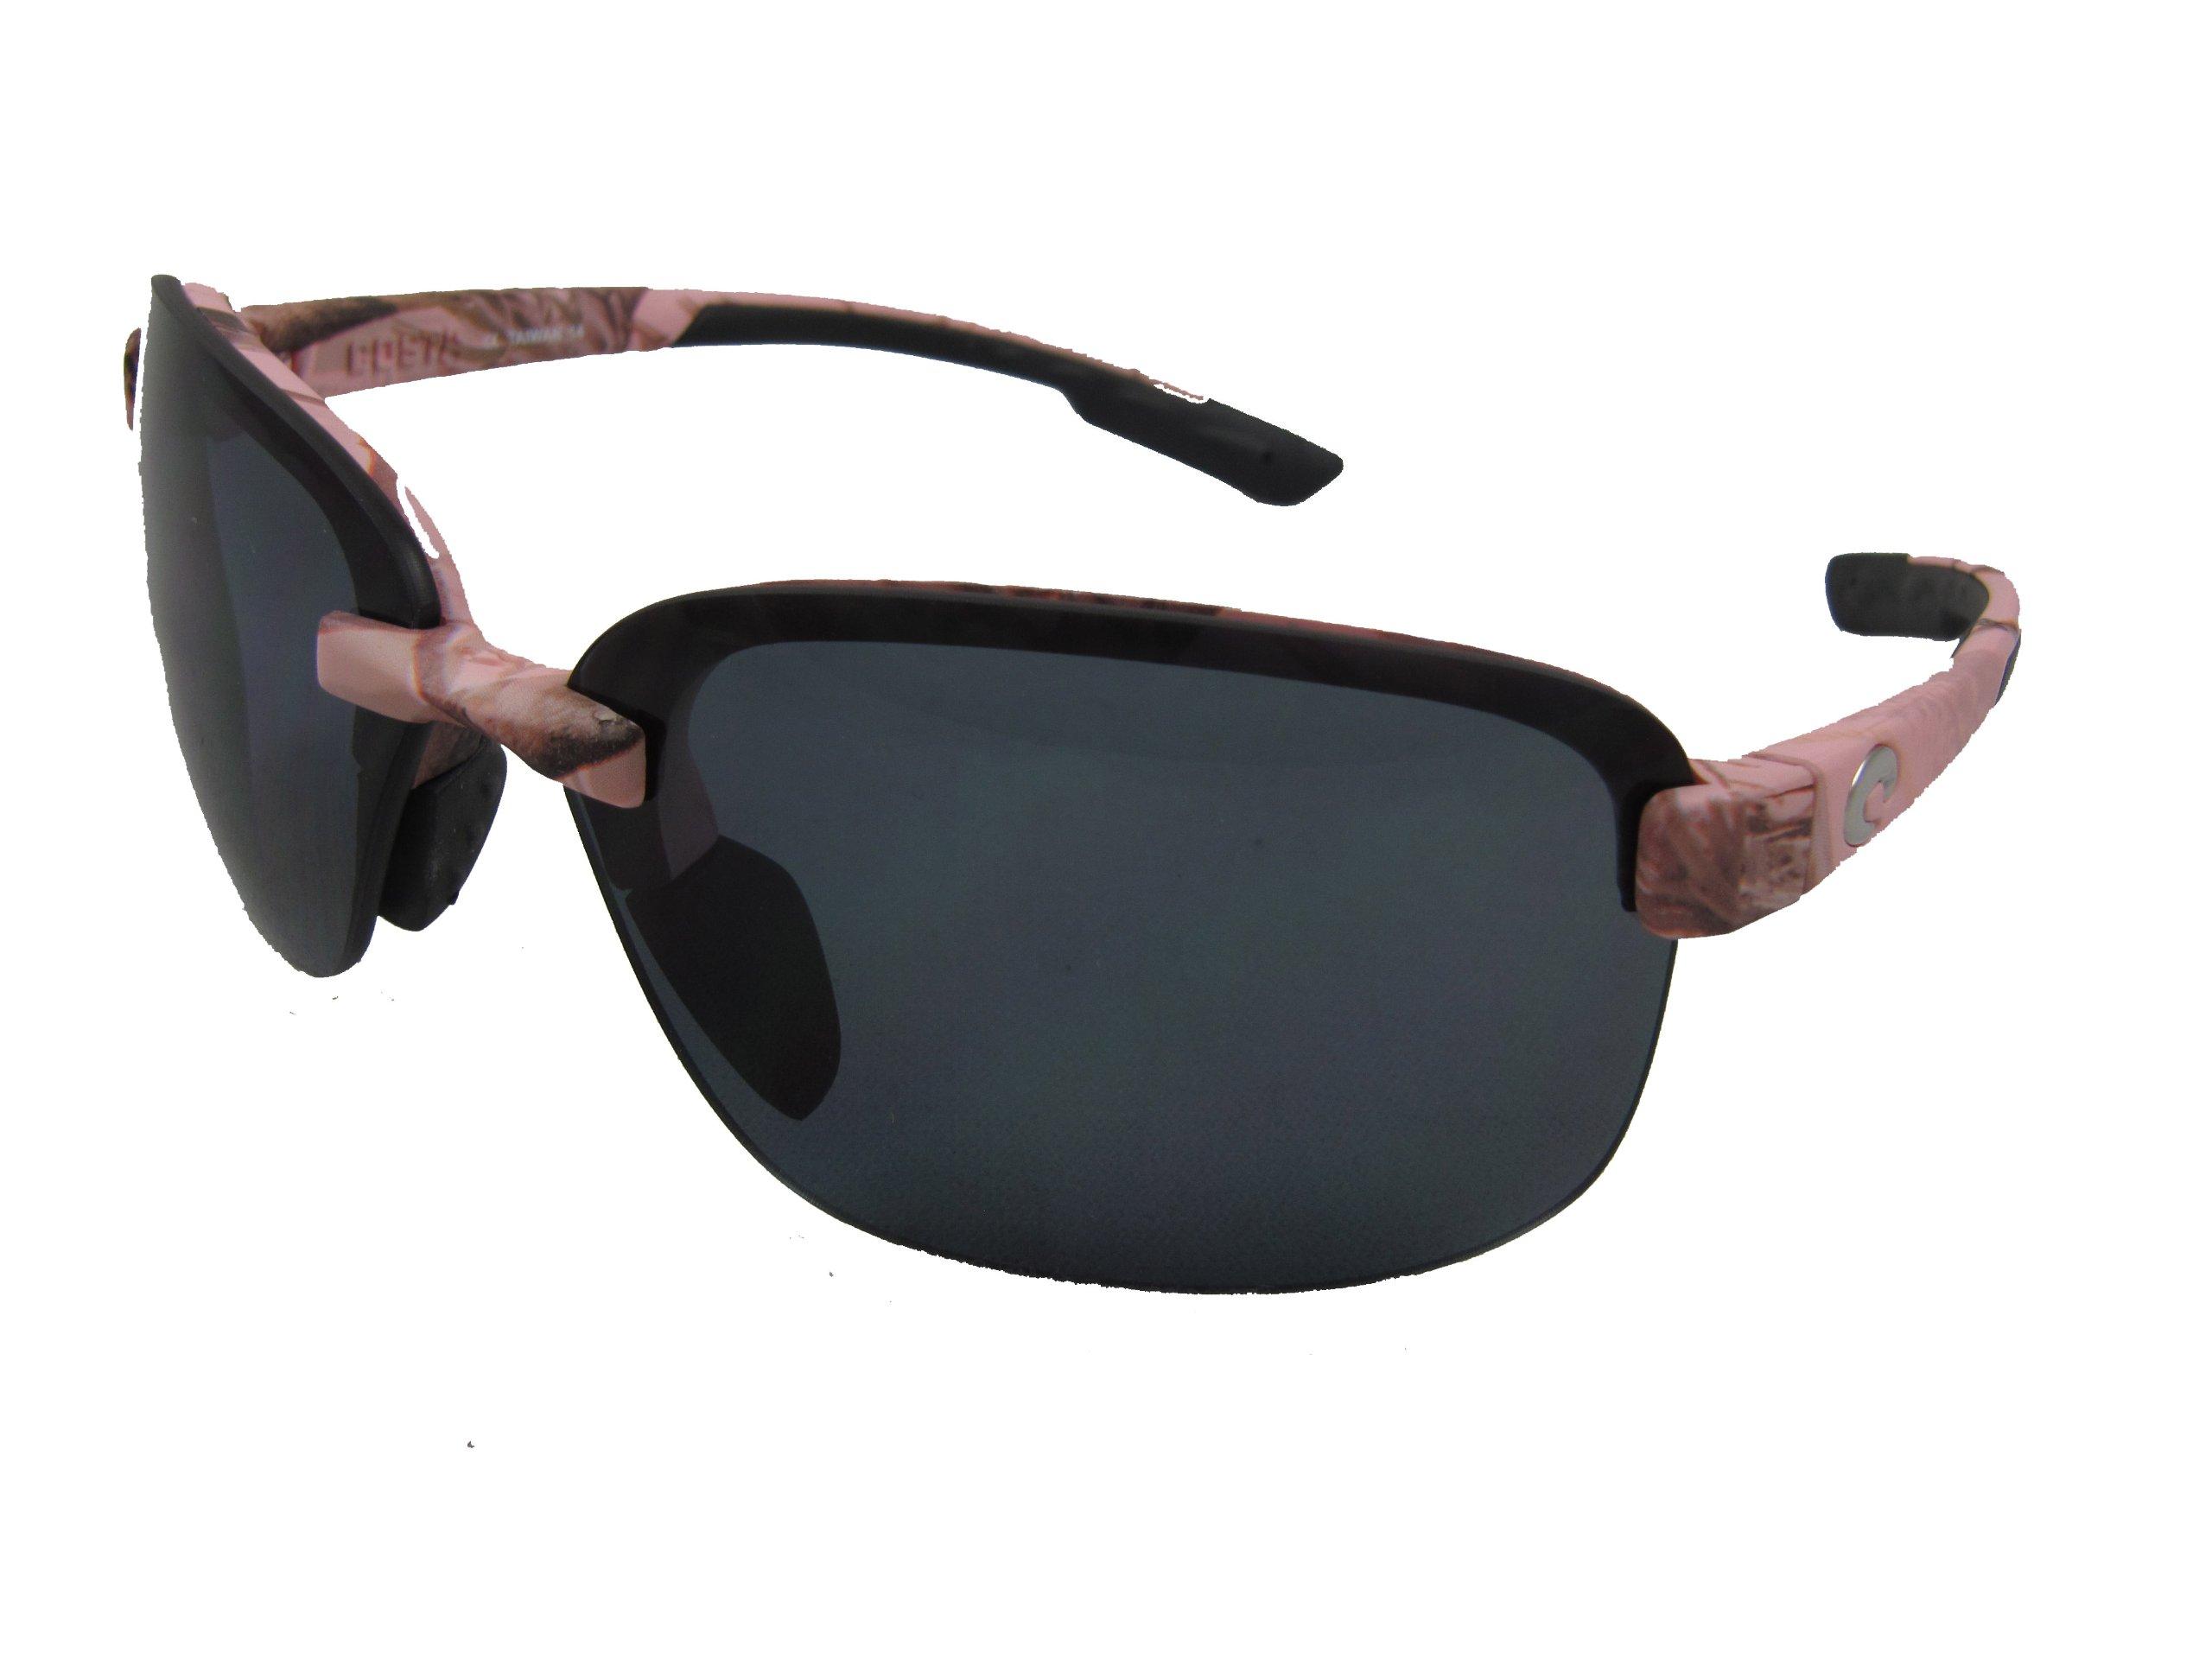 Costa Del Mar Austin Adult Polarized Sunglasses, Realtree AP Pink/Gray 580Plastic